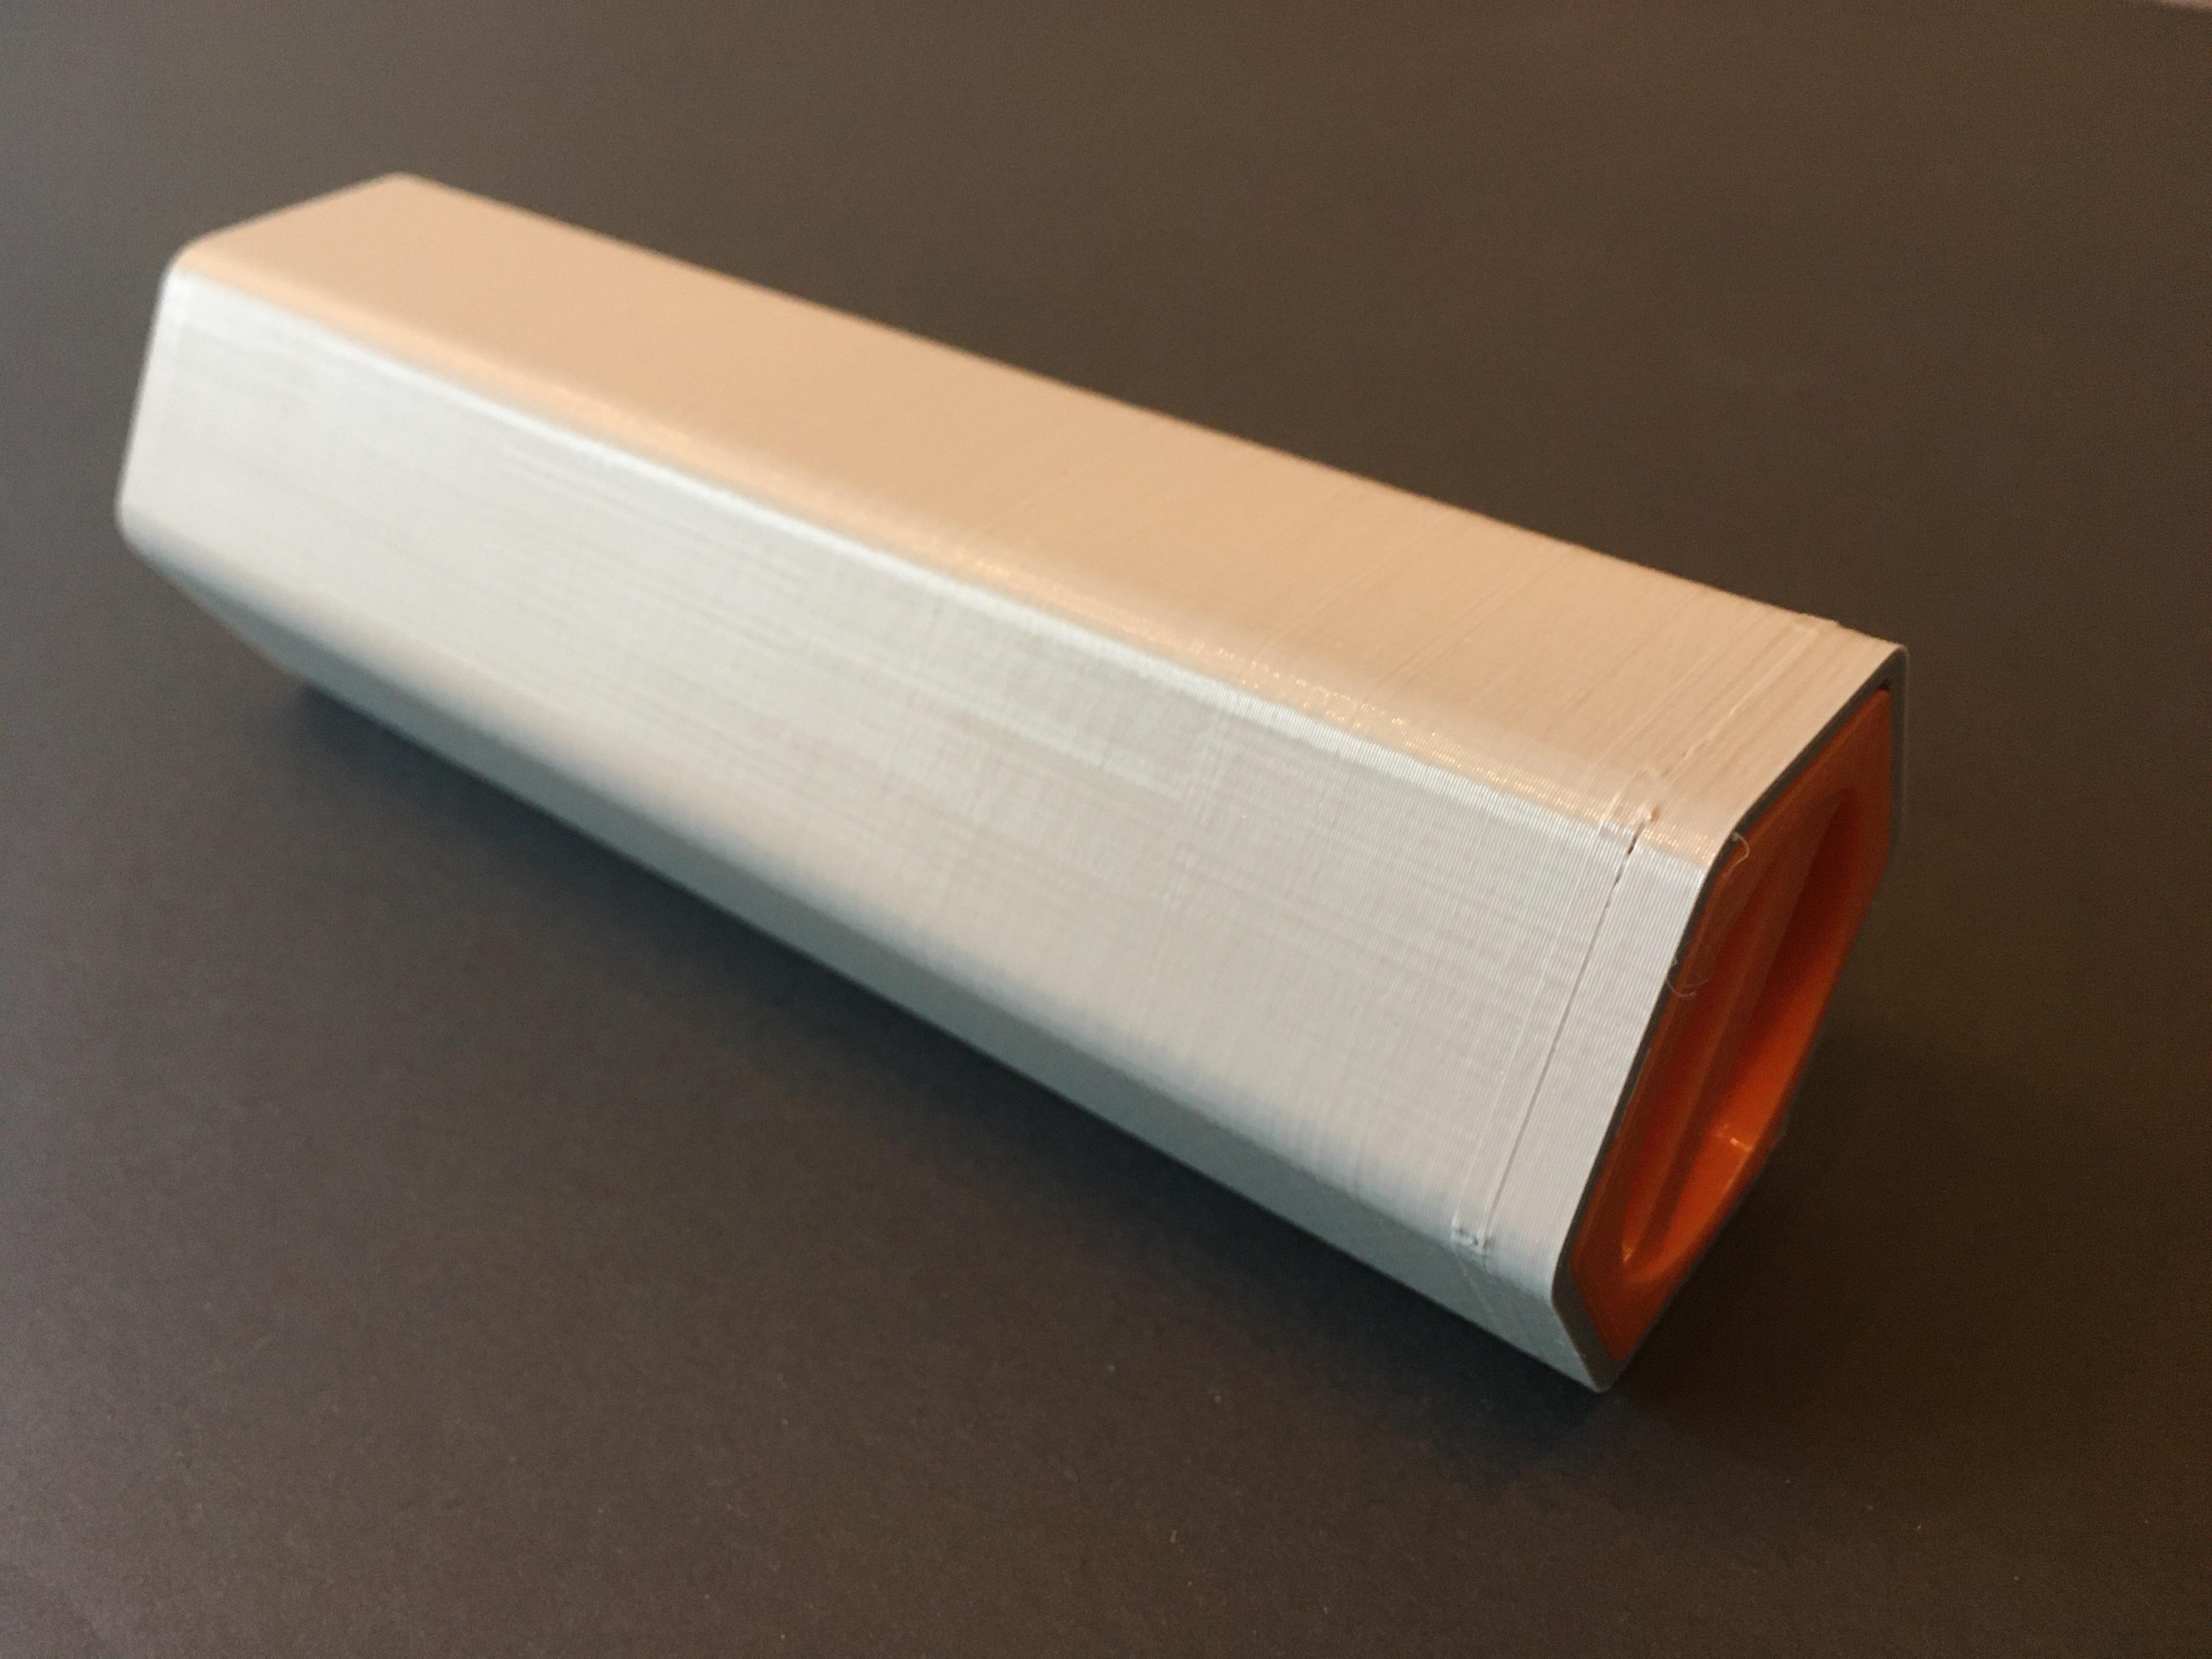 IMG-3580.JPG Download STL file HexaPill - Modular pillbox / pill dispenser • 3D printing design, yozz